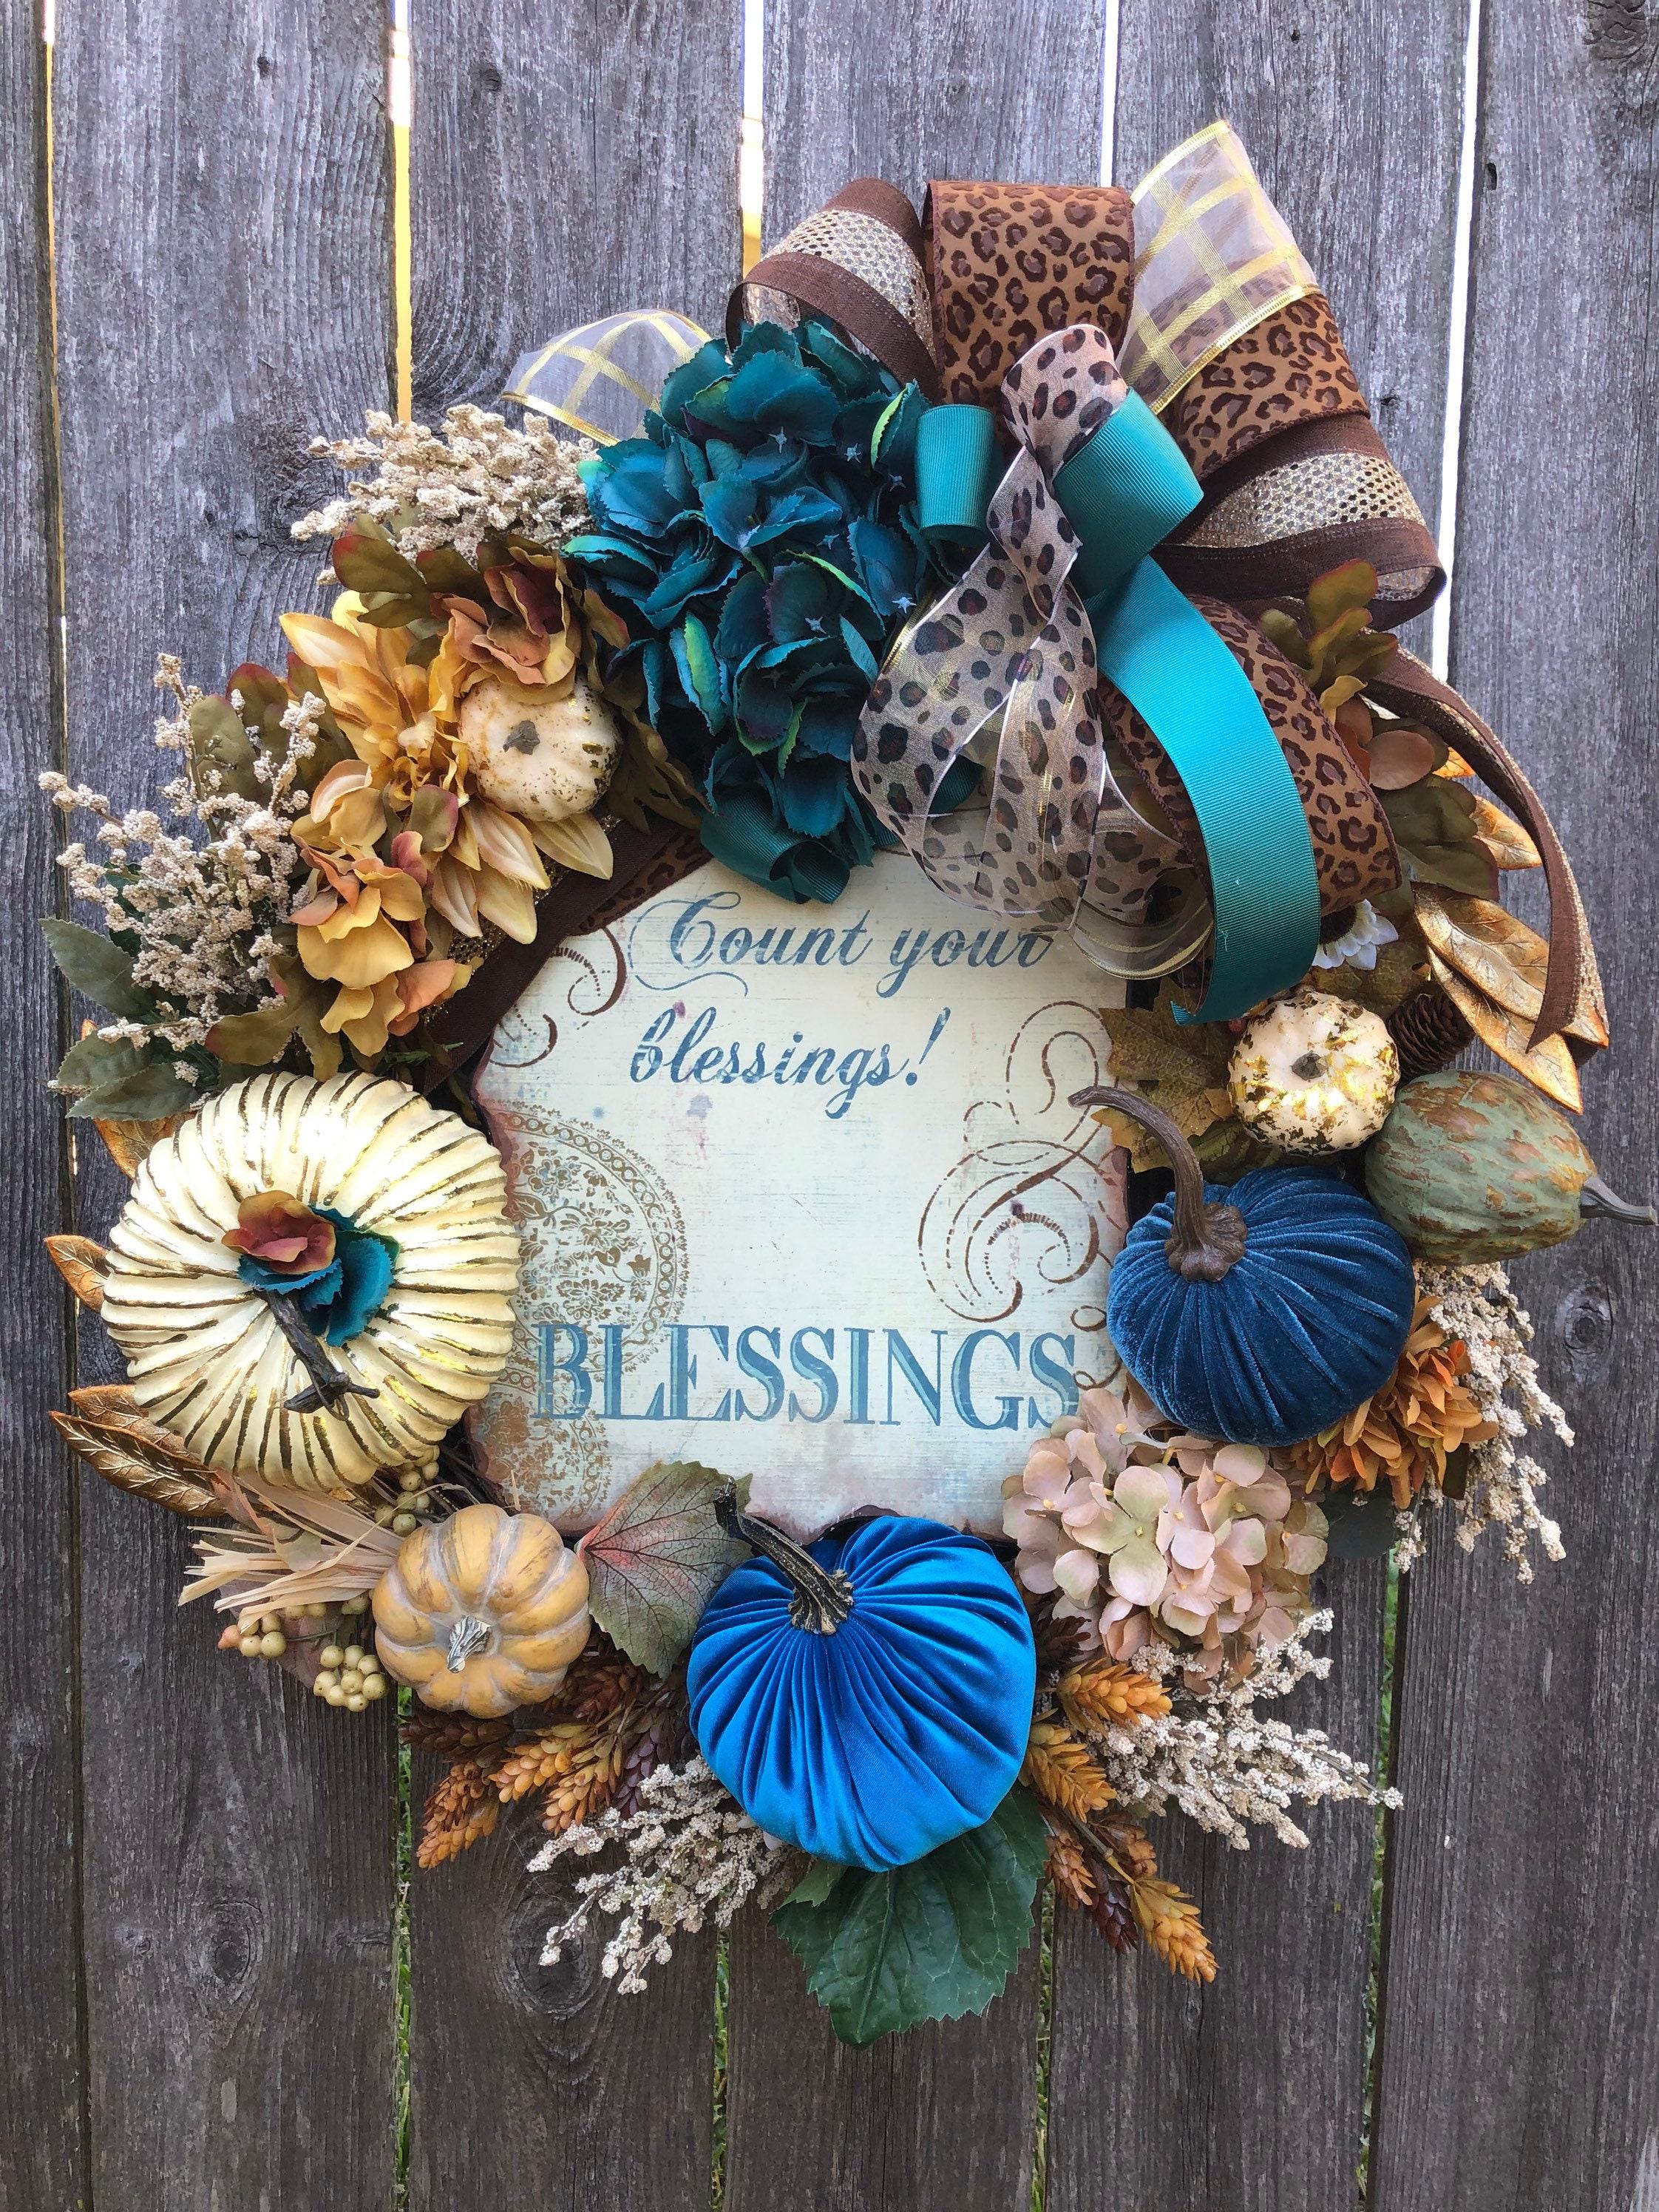 Count Your Blessings Teal Blue Fall Pumpkin Wreath Thanksgiving Wreath Burlap Bow Grapevine Cheetah Accent Wreath